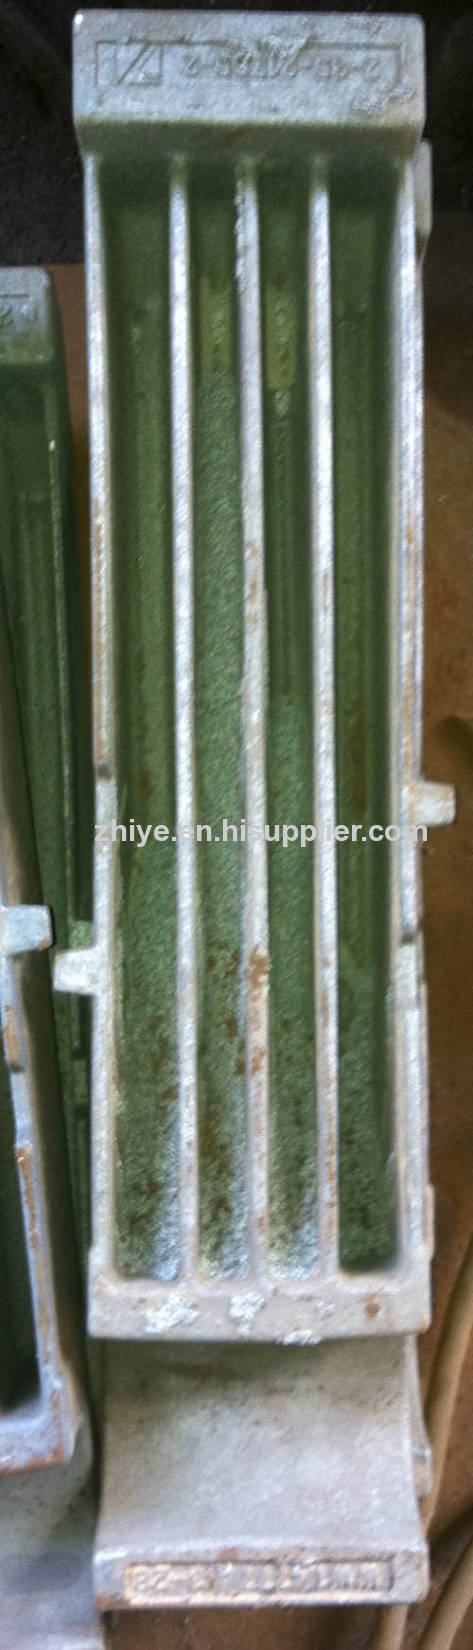 ductile iron casting furnace bar